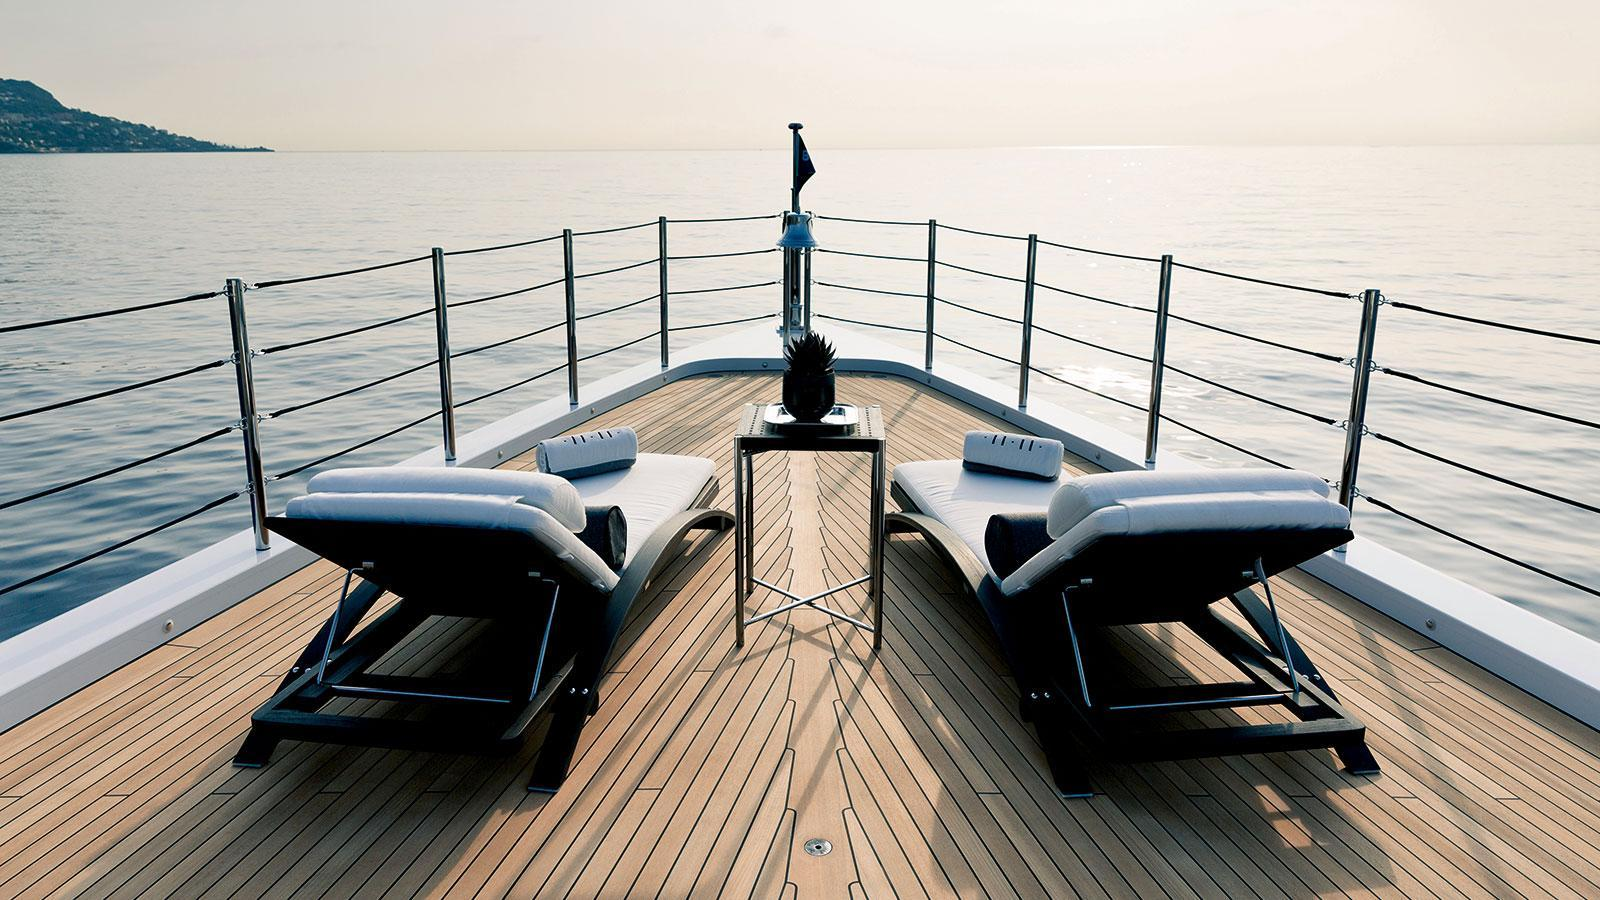 1111-motor-yacht-benetti-2015-63m-foredeck